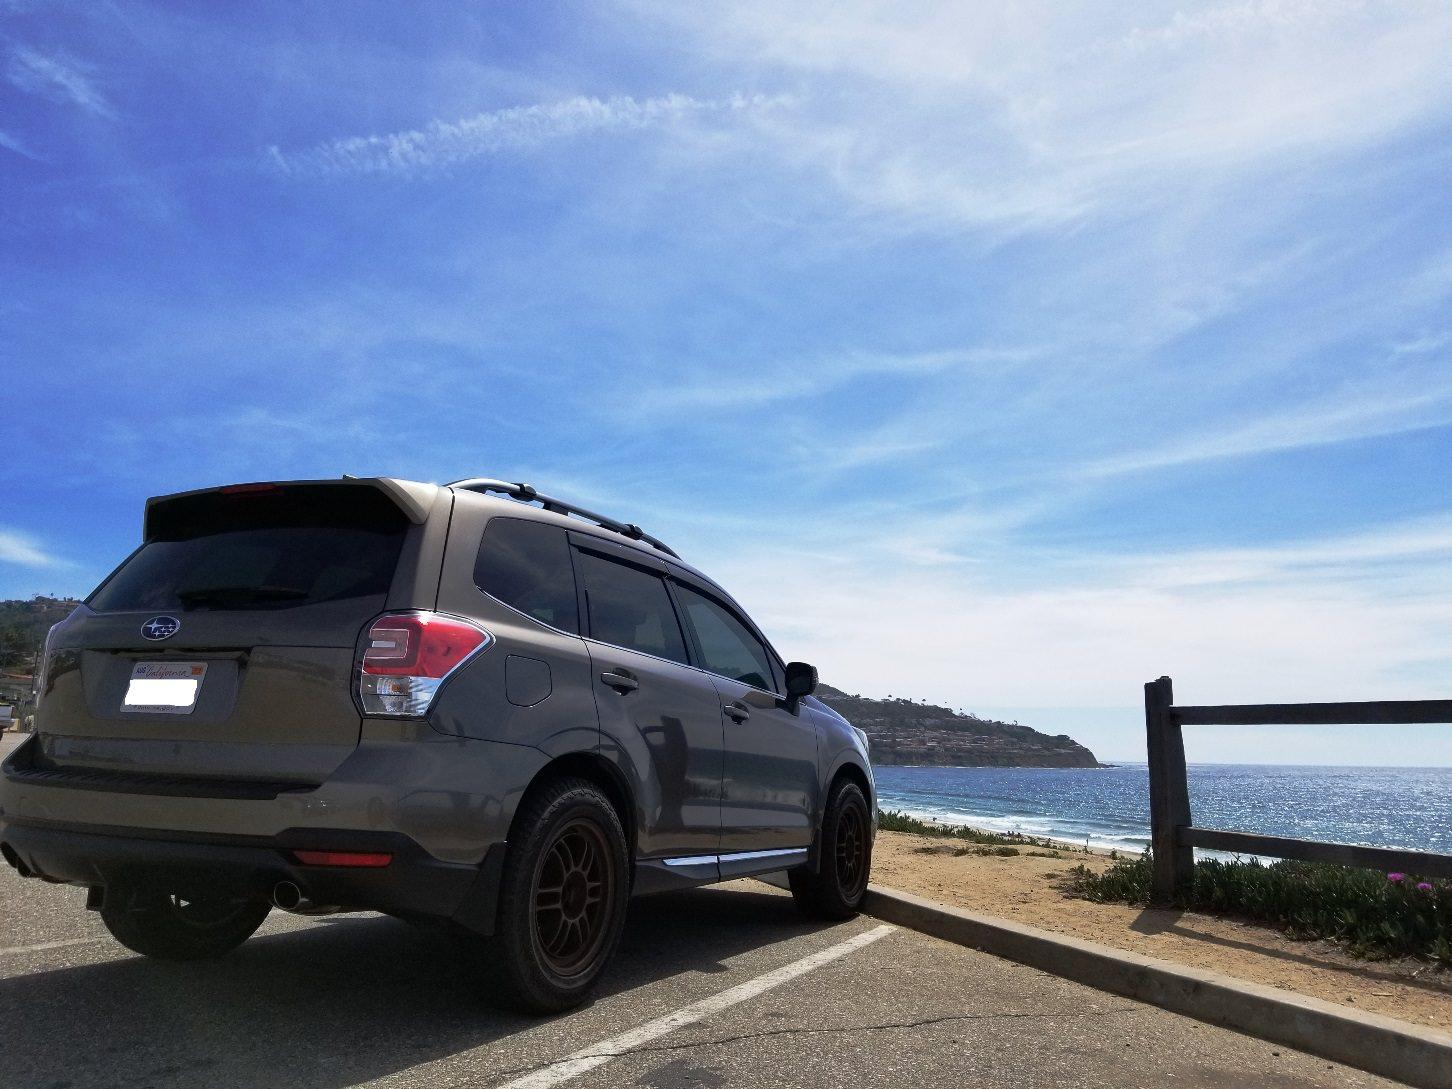 14-'18) - Waldo's 2017 F-XT Touring   Subaru Forester Owners